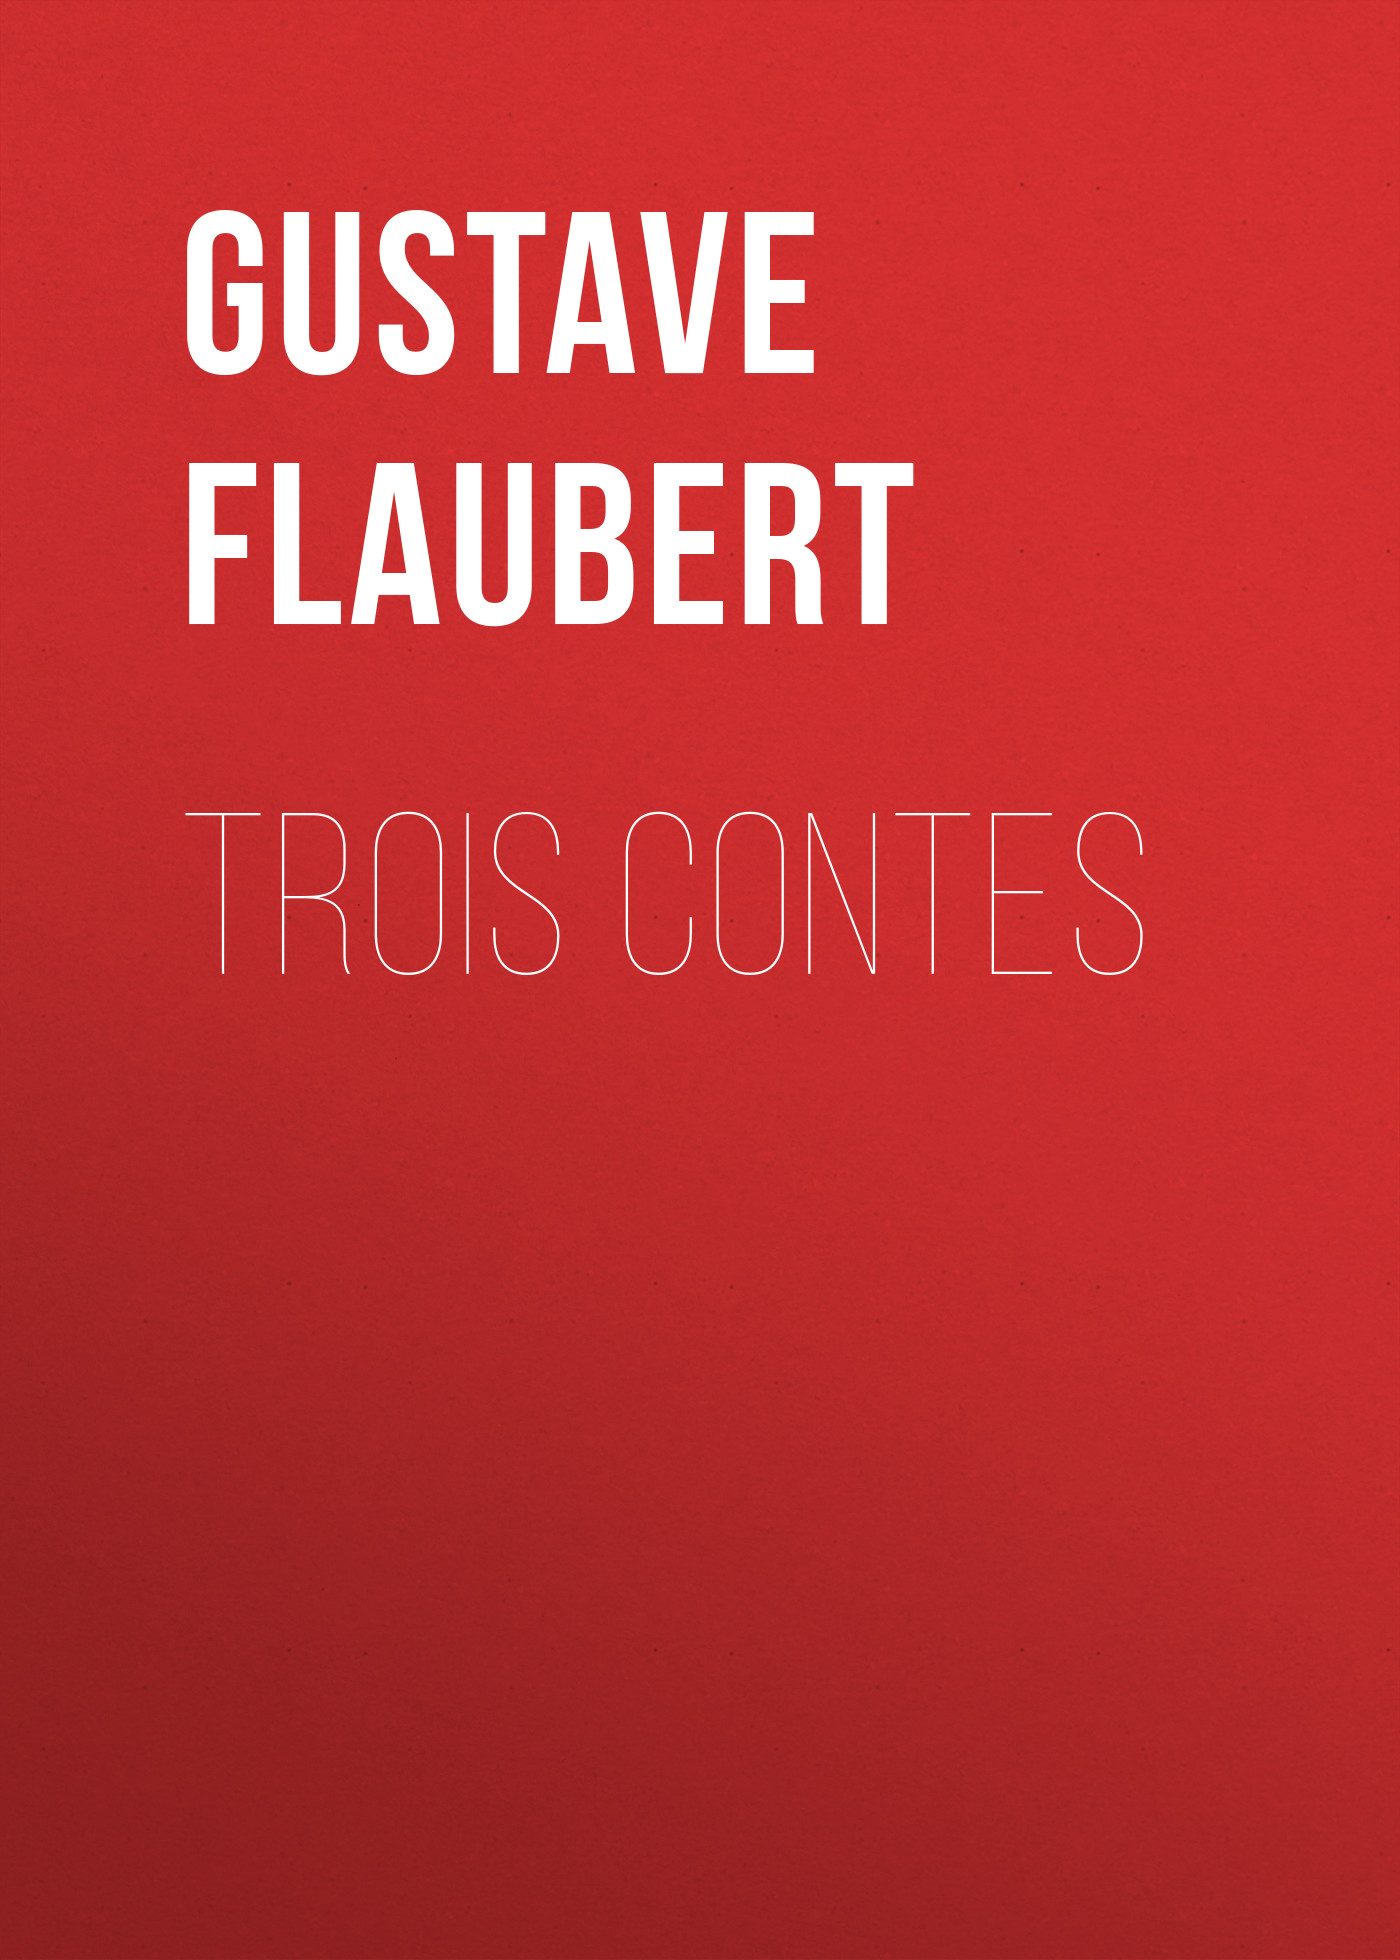 Gustave Flaubert Trois contes цены онлайн